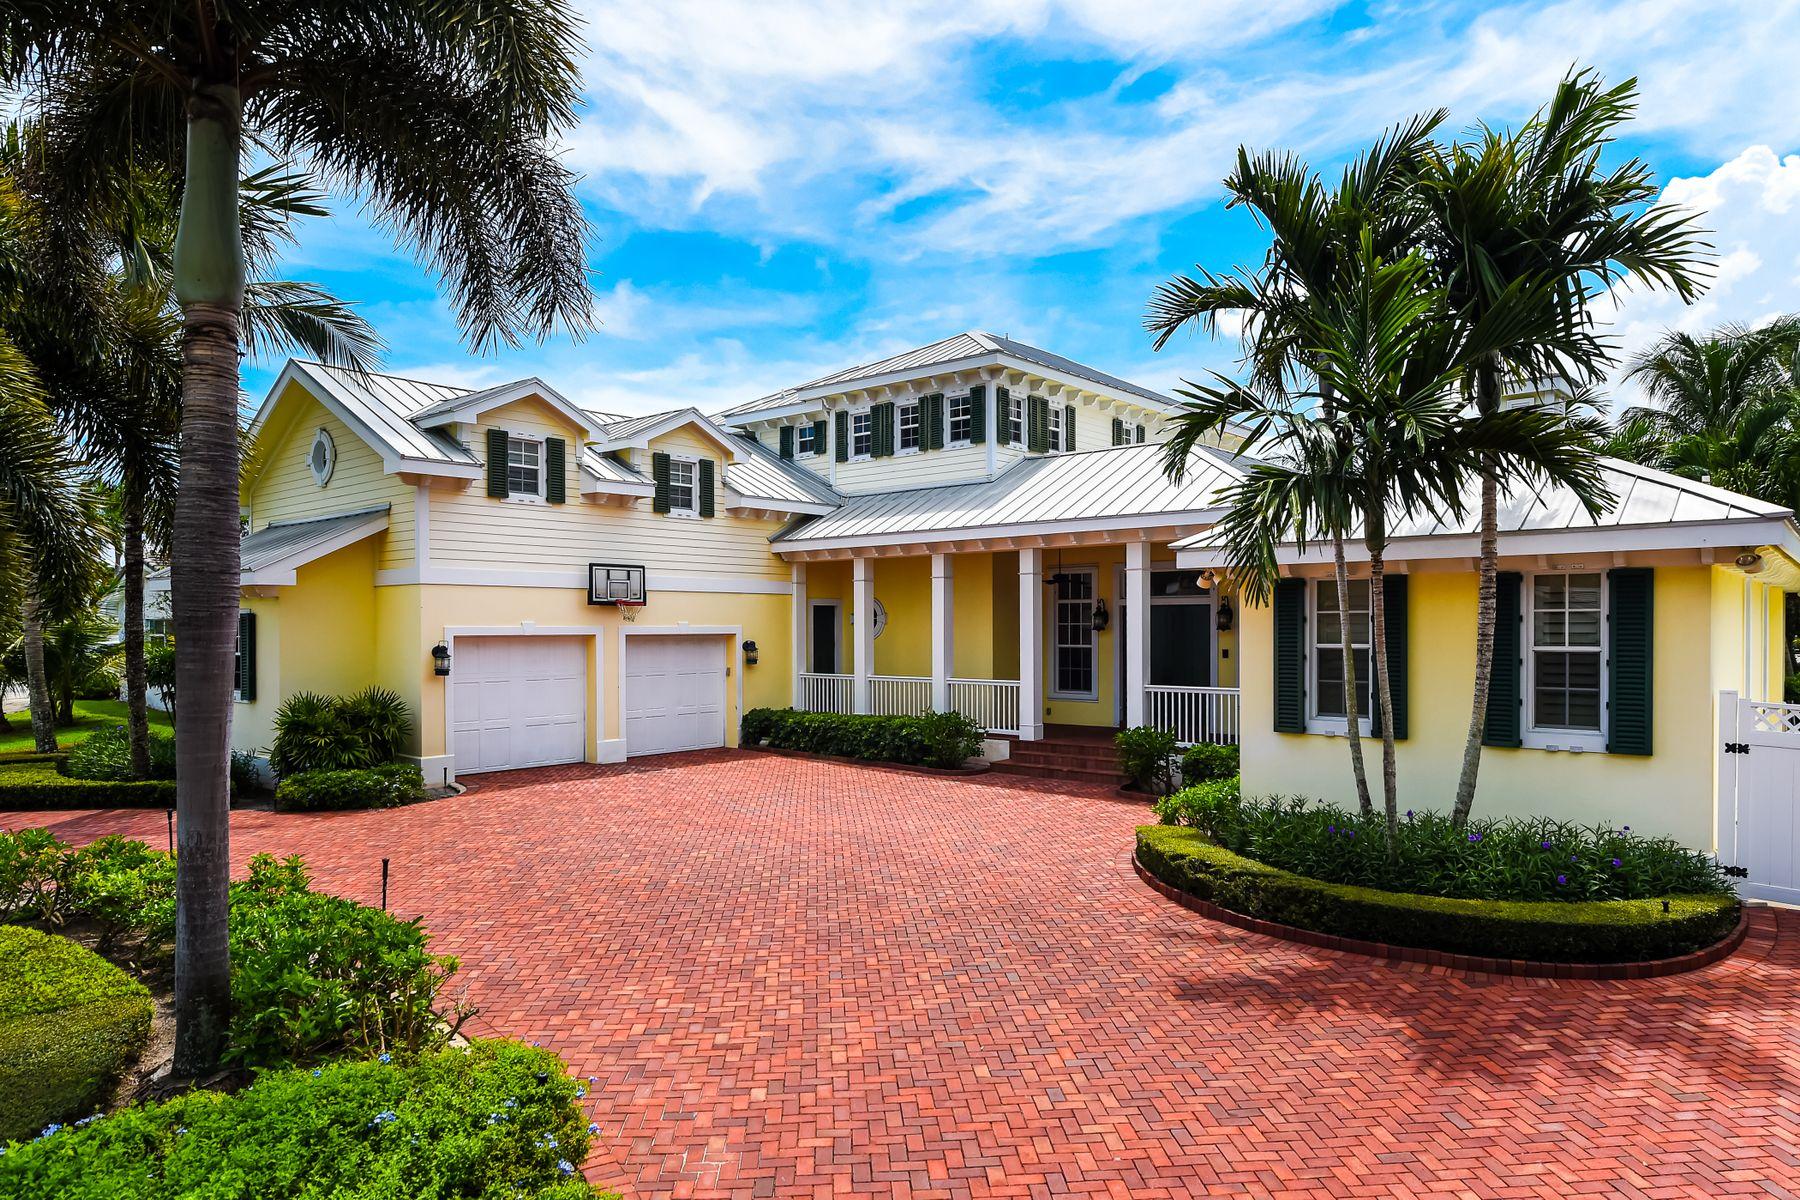 Single Family Homes için Satış at North Palm Waterfront 831 Country Club Dr, North Palm Beach, Florida 33408 Amerika Birleşik Devletleri